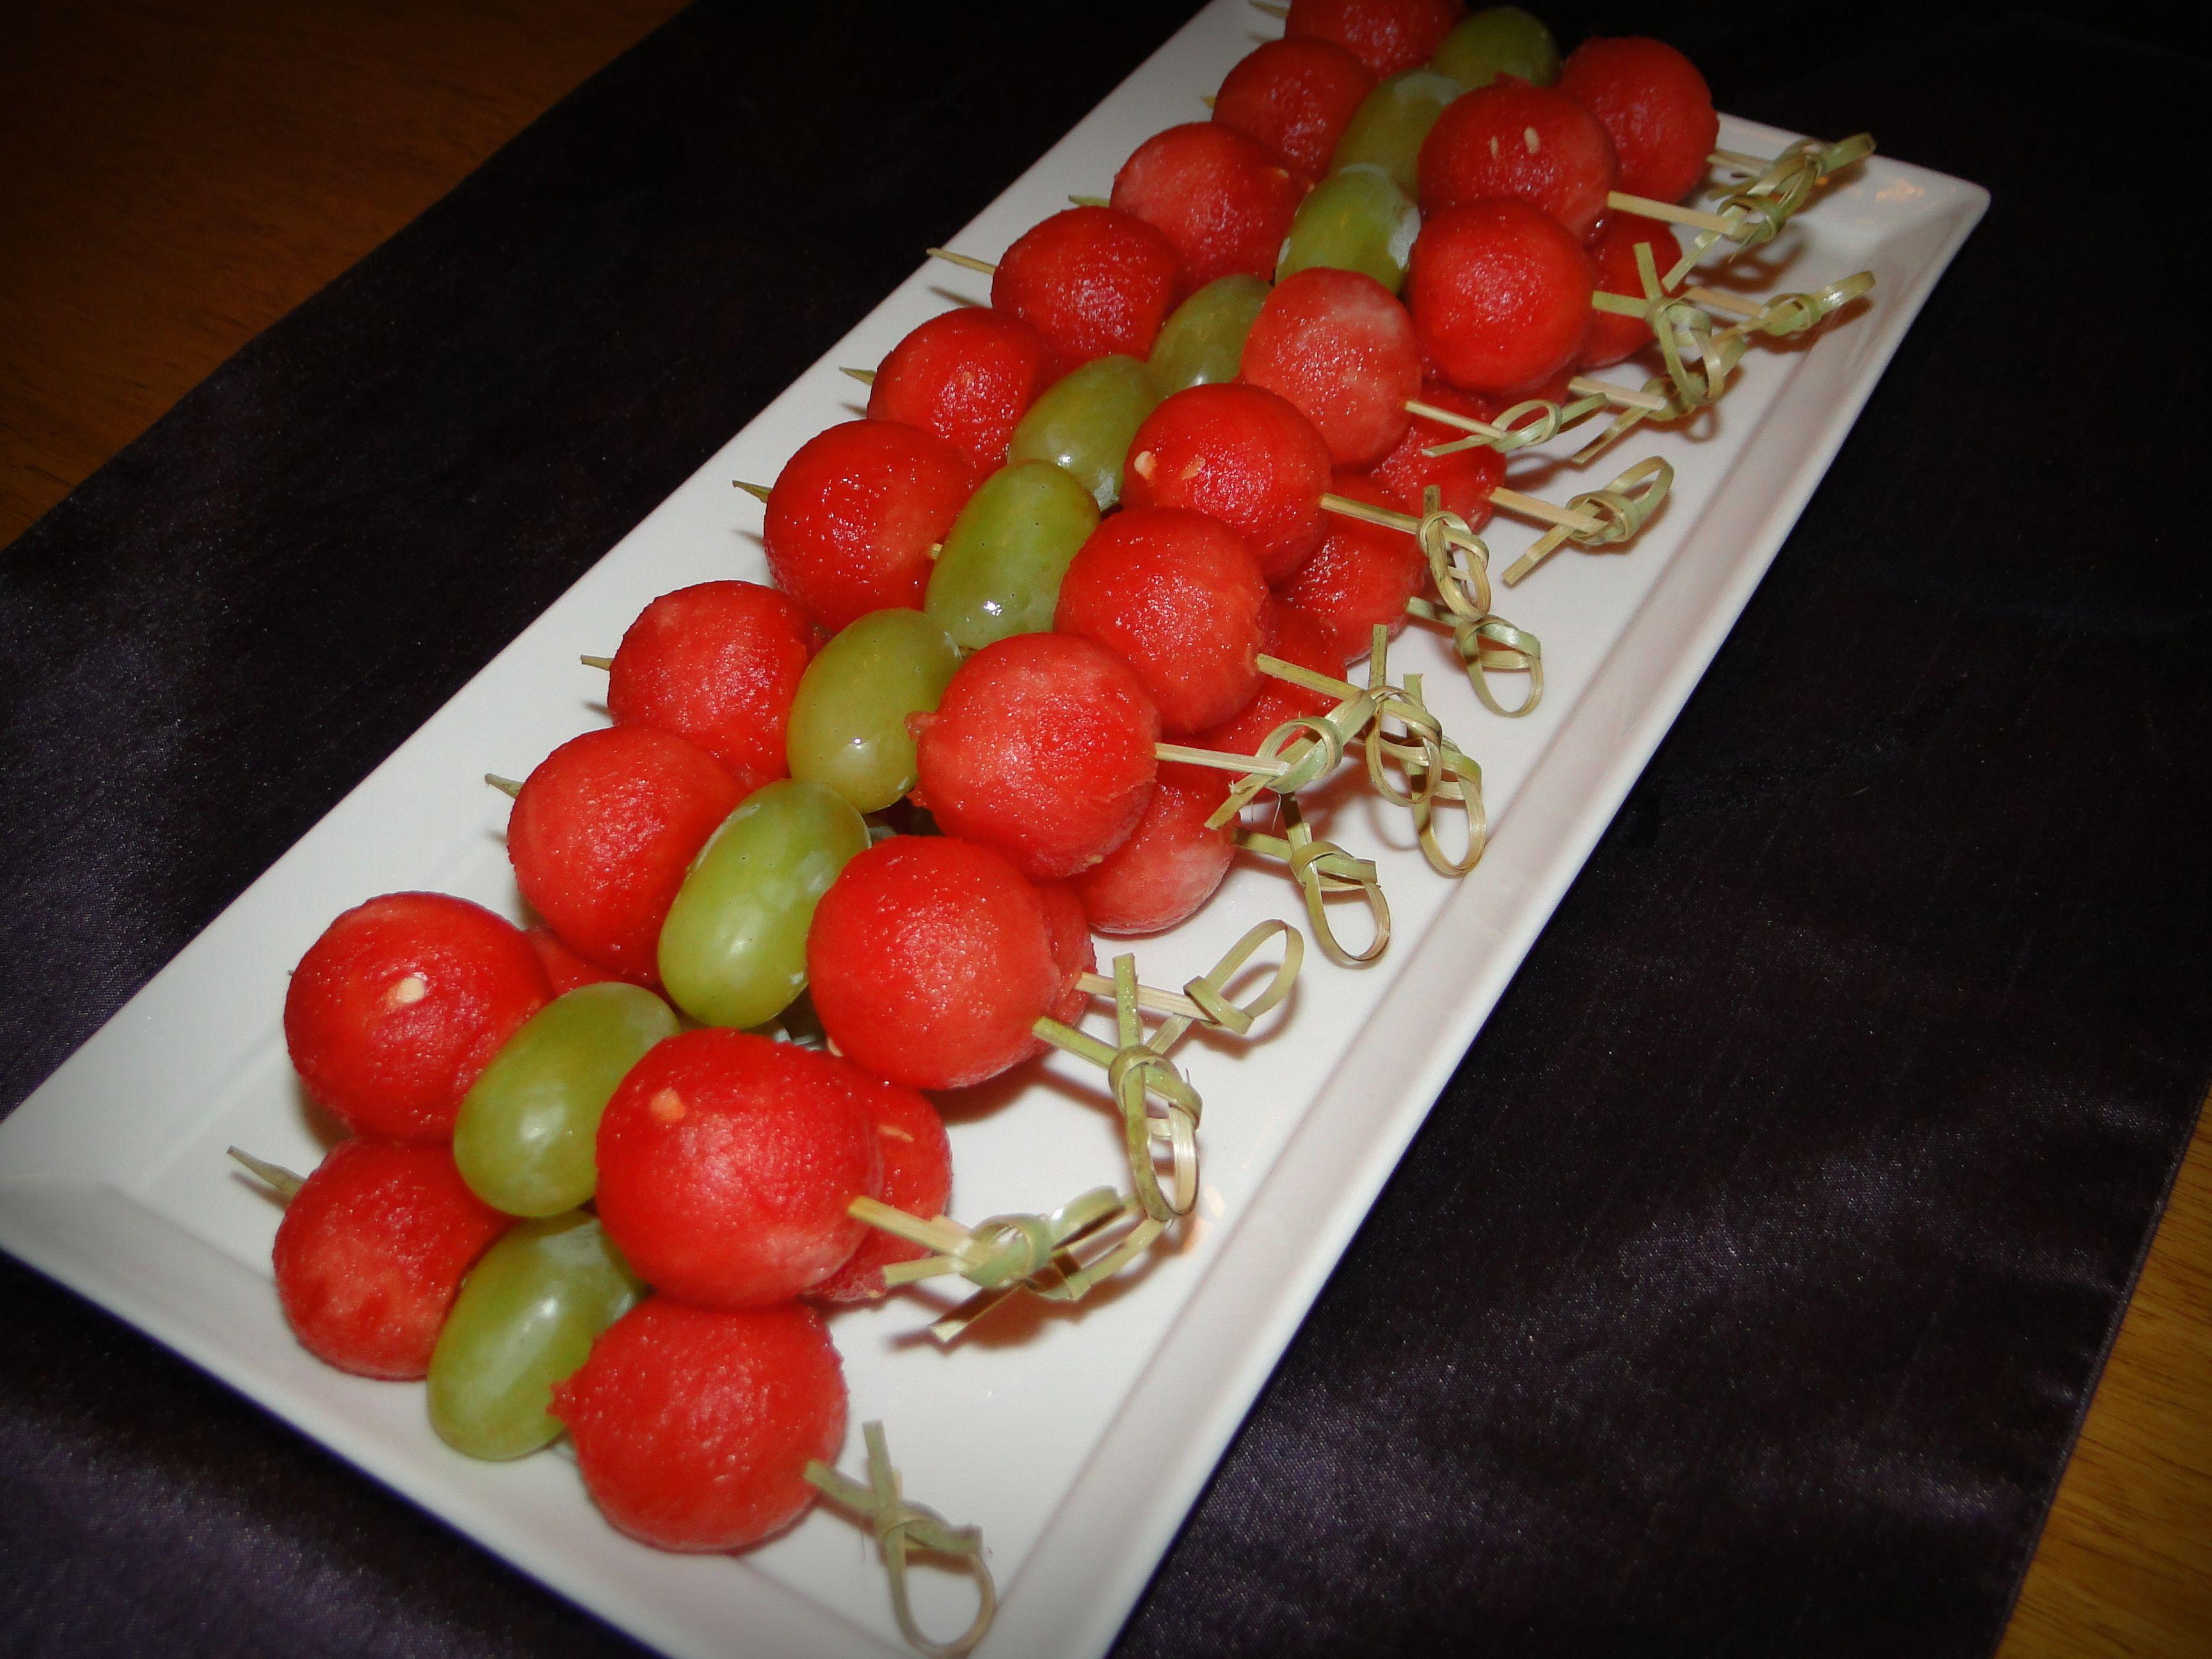 Watermelon balls \u0026 grapes   Food \u0026 Entertainment   Pinterest ...